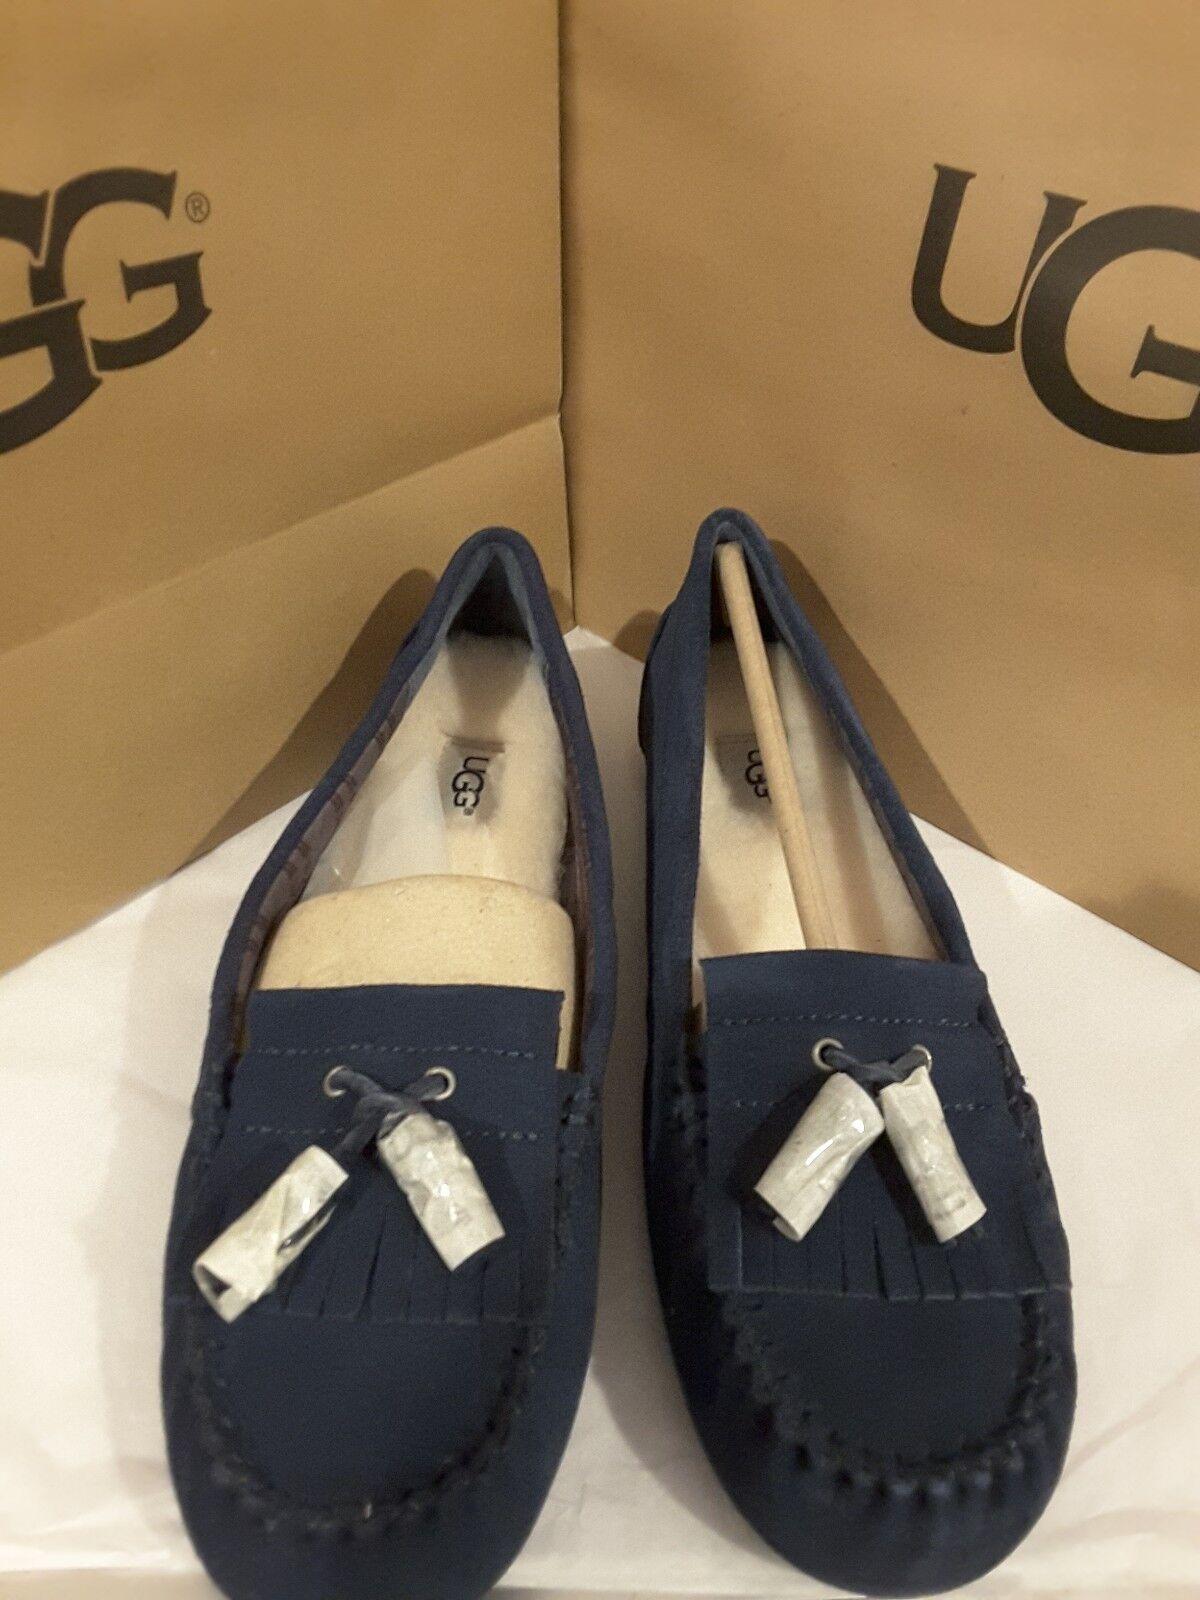 adbf85eba27 NWT UGG Women's Lizzy navy blue SHEEPSKIN MOCCASIN SLIPPERS women's ...